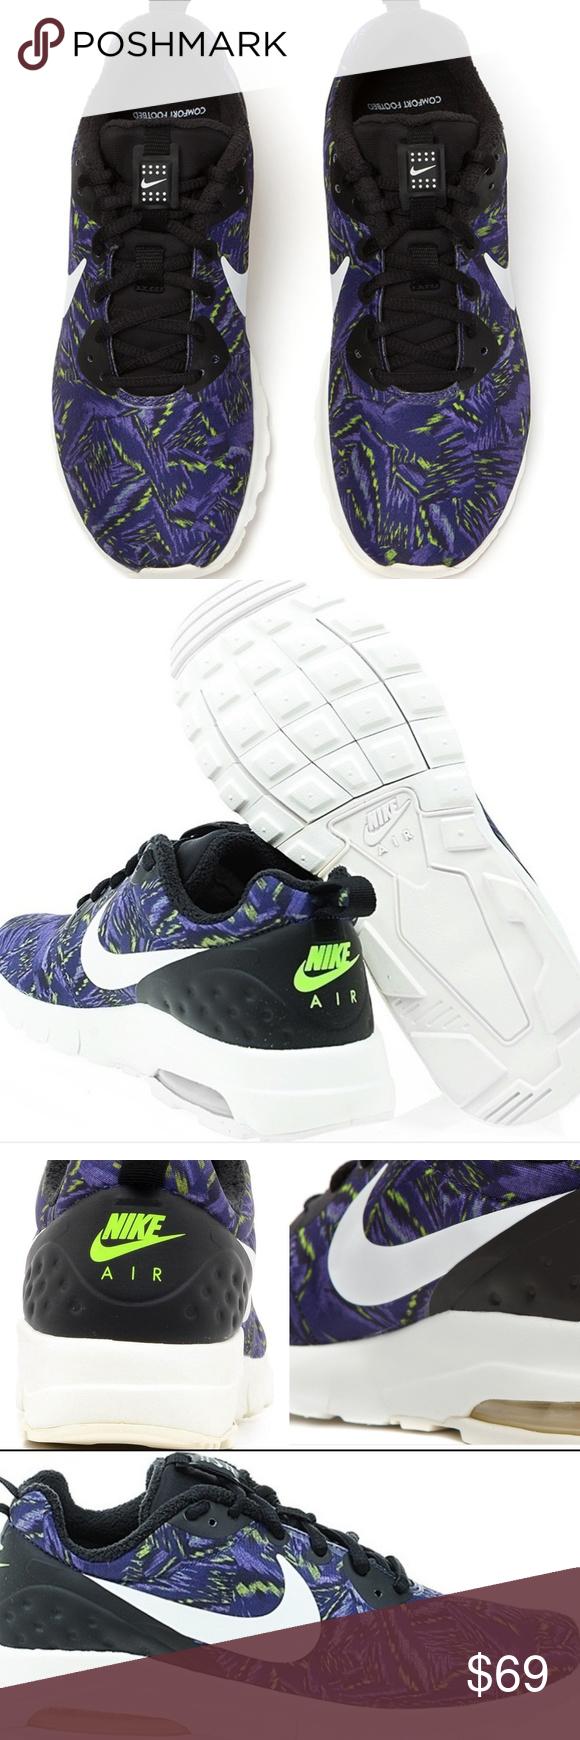 nwob women s nike air max motion lw print sneaker nike air max